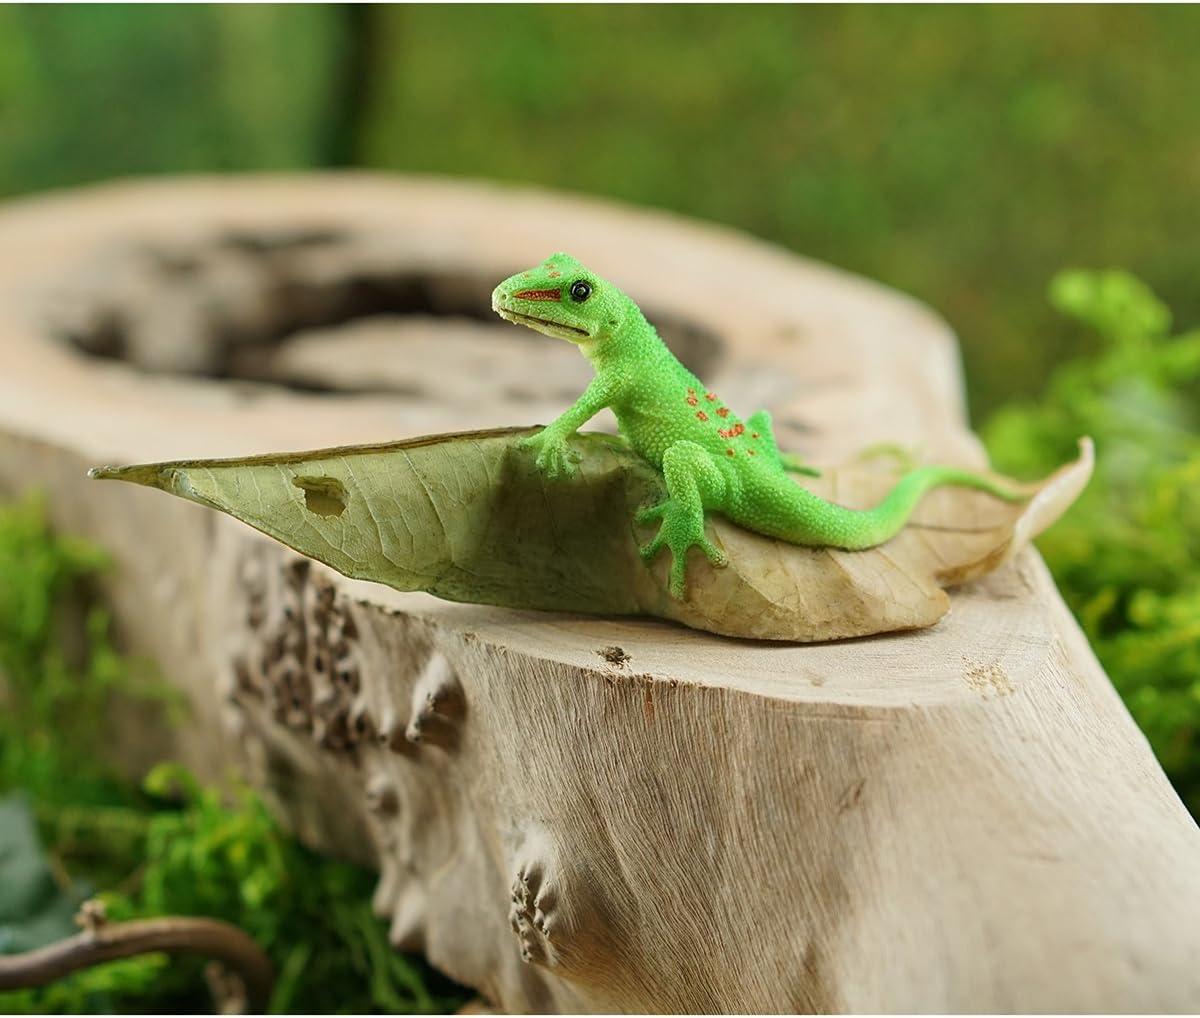 Details about  /Green Brown Lizard Lifelike Fairy Garden Terrarium Balcony Decor Figurine Toy